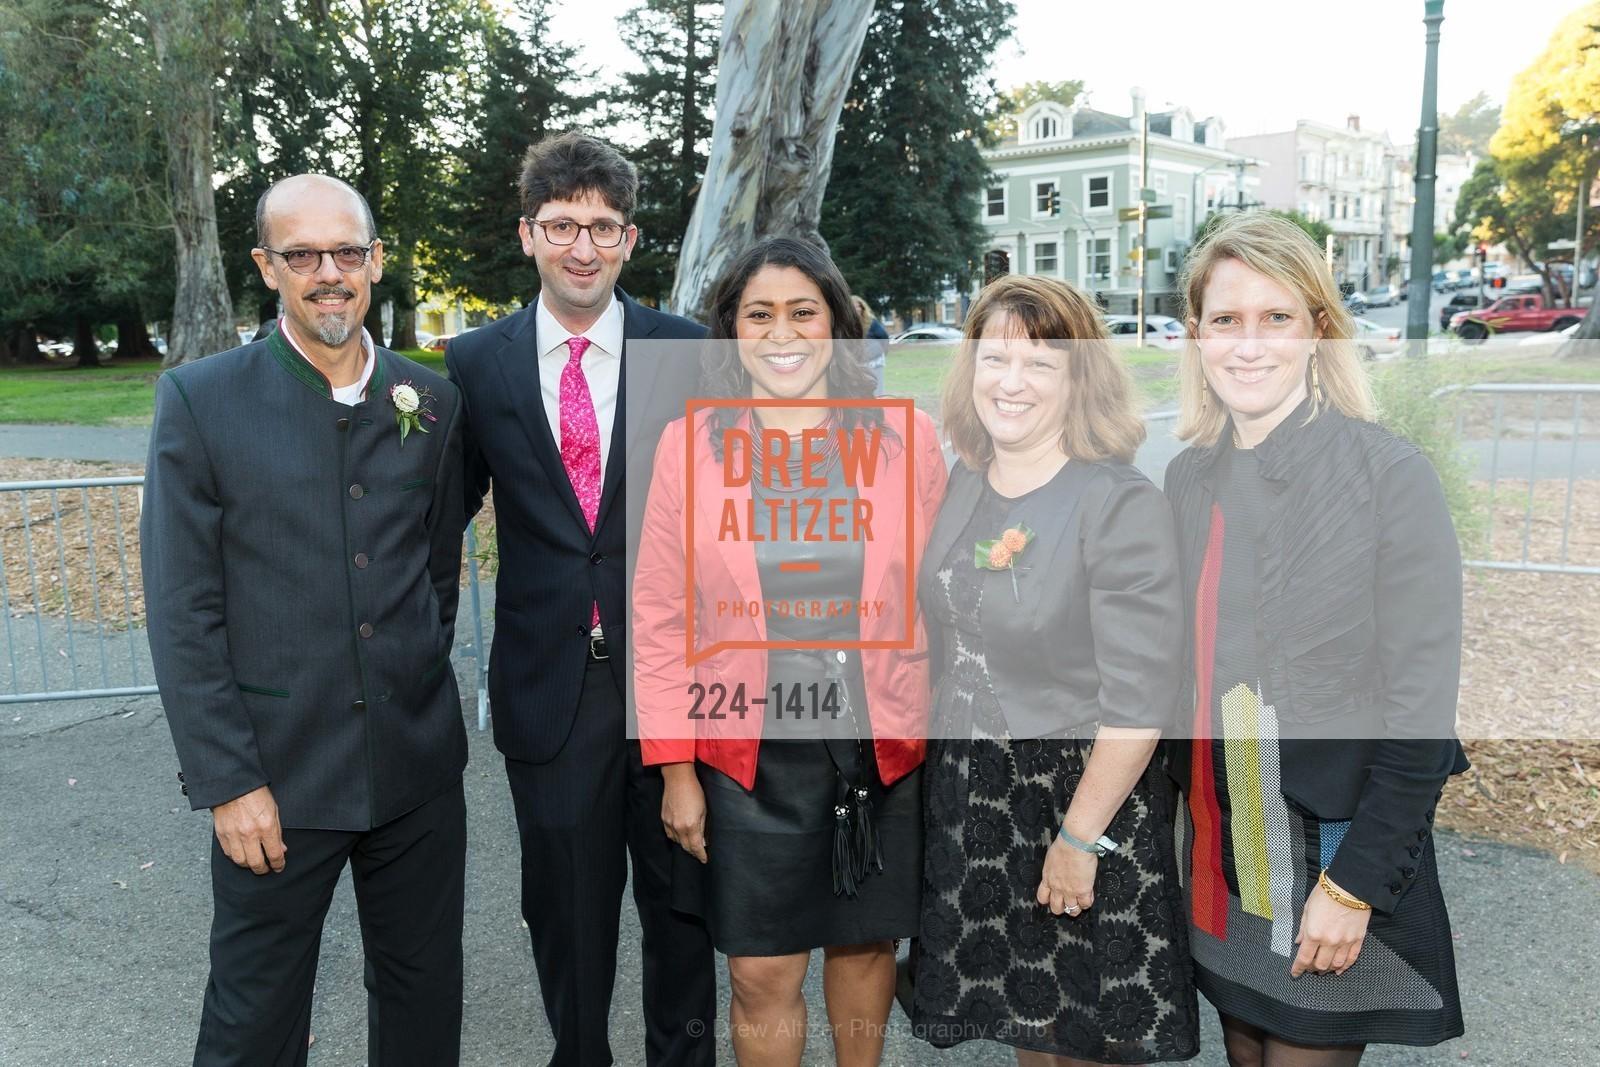 Tim Seufert, Christian Cebrian, London Breed, Rachel Norton, Amy Cebrian, Photo #224-1414